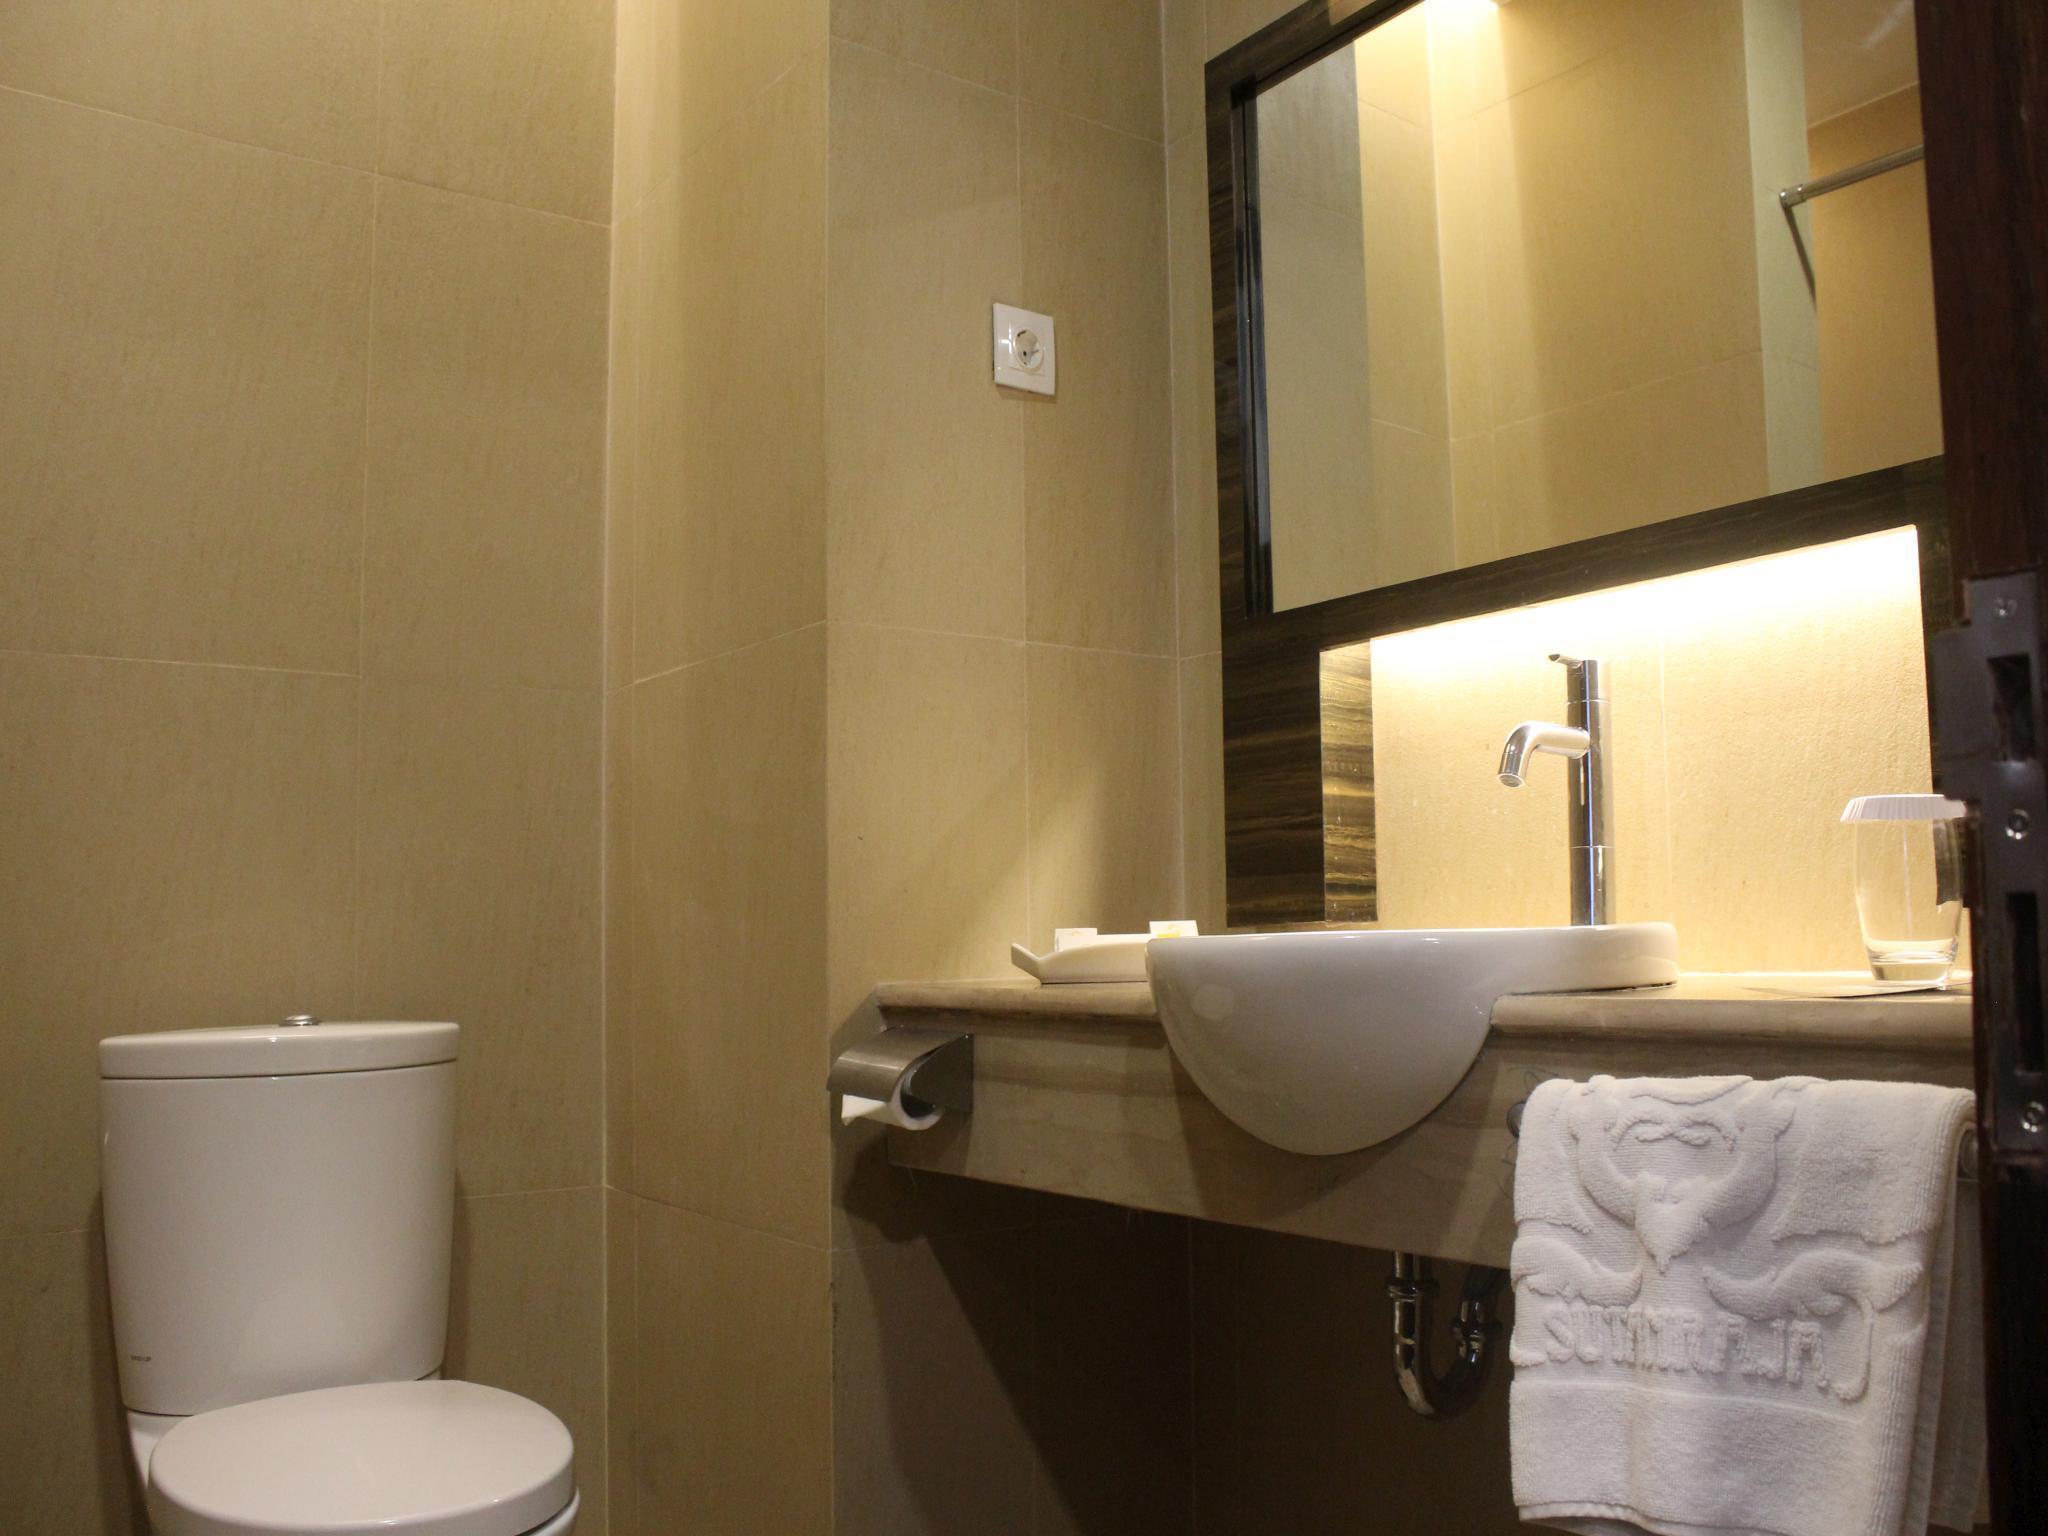 Hotel Hotel Sutan Raja Kotamobagu - Jalan Siliwangi - Kotamobagu